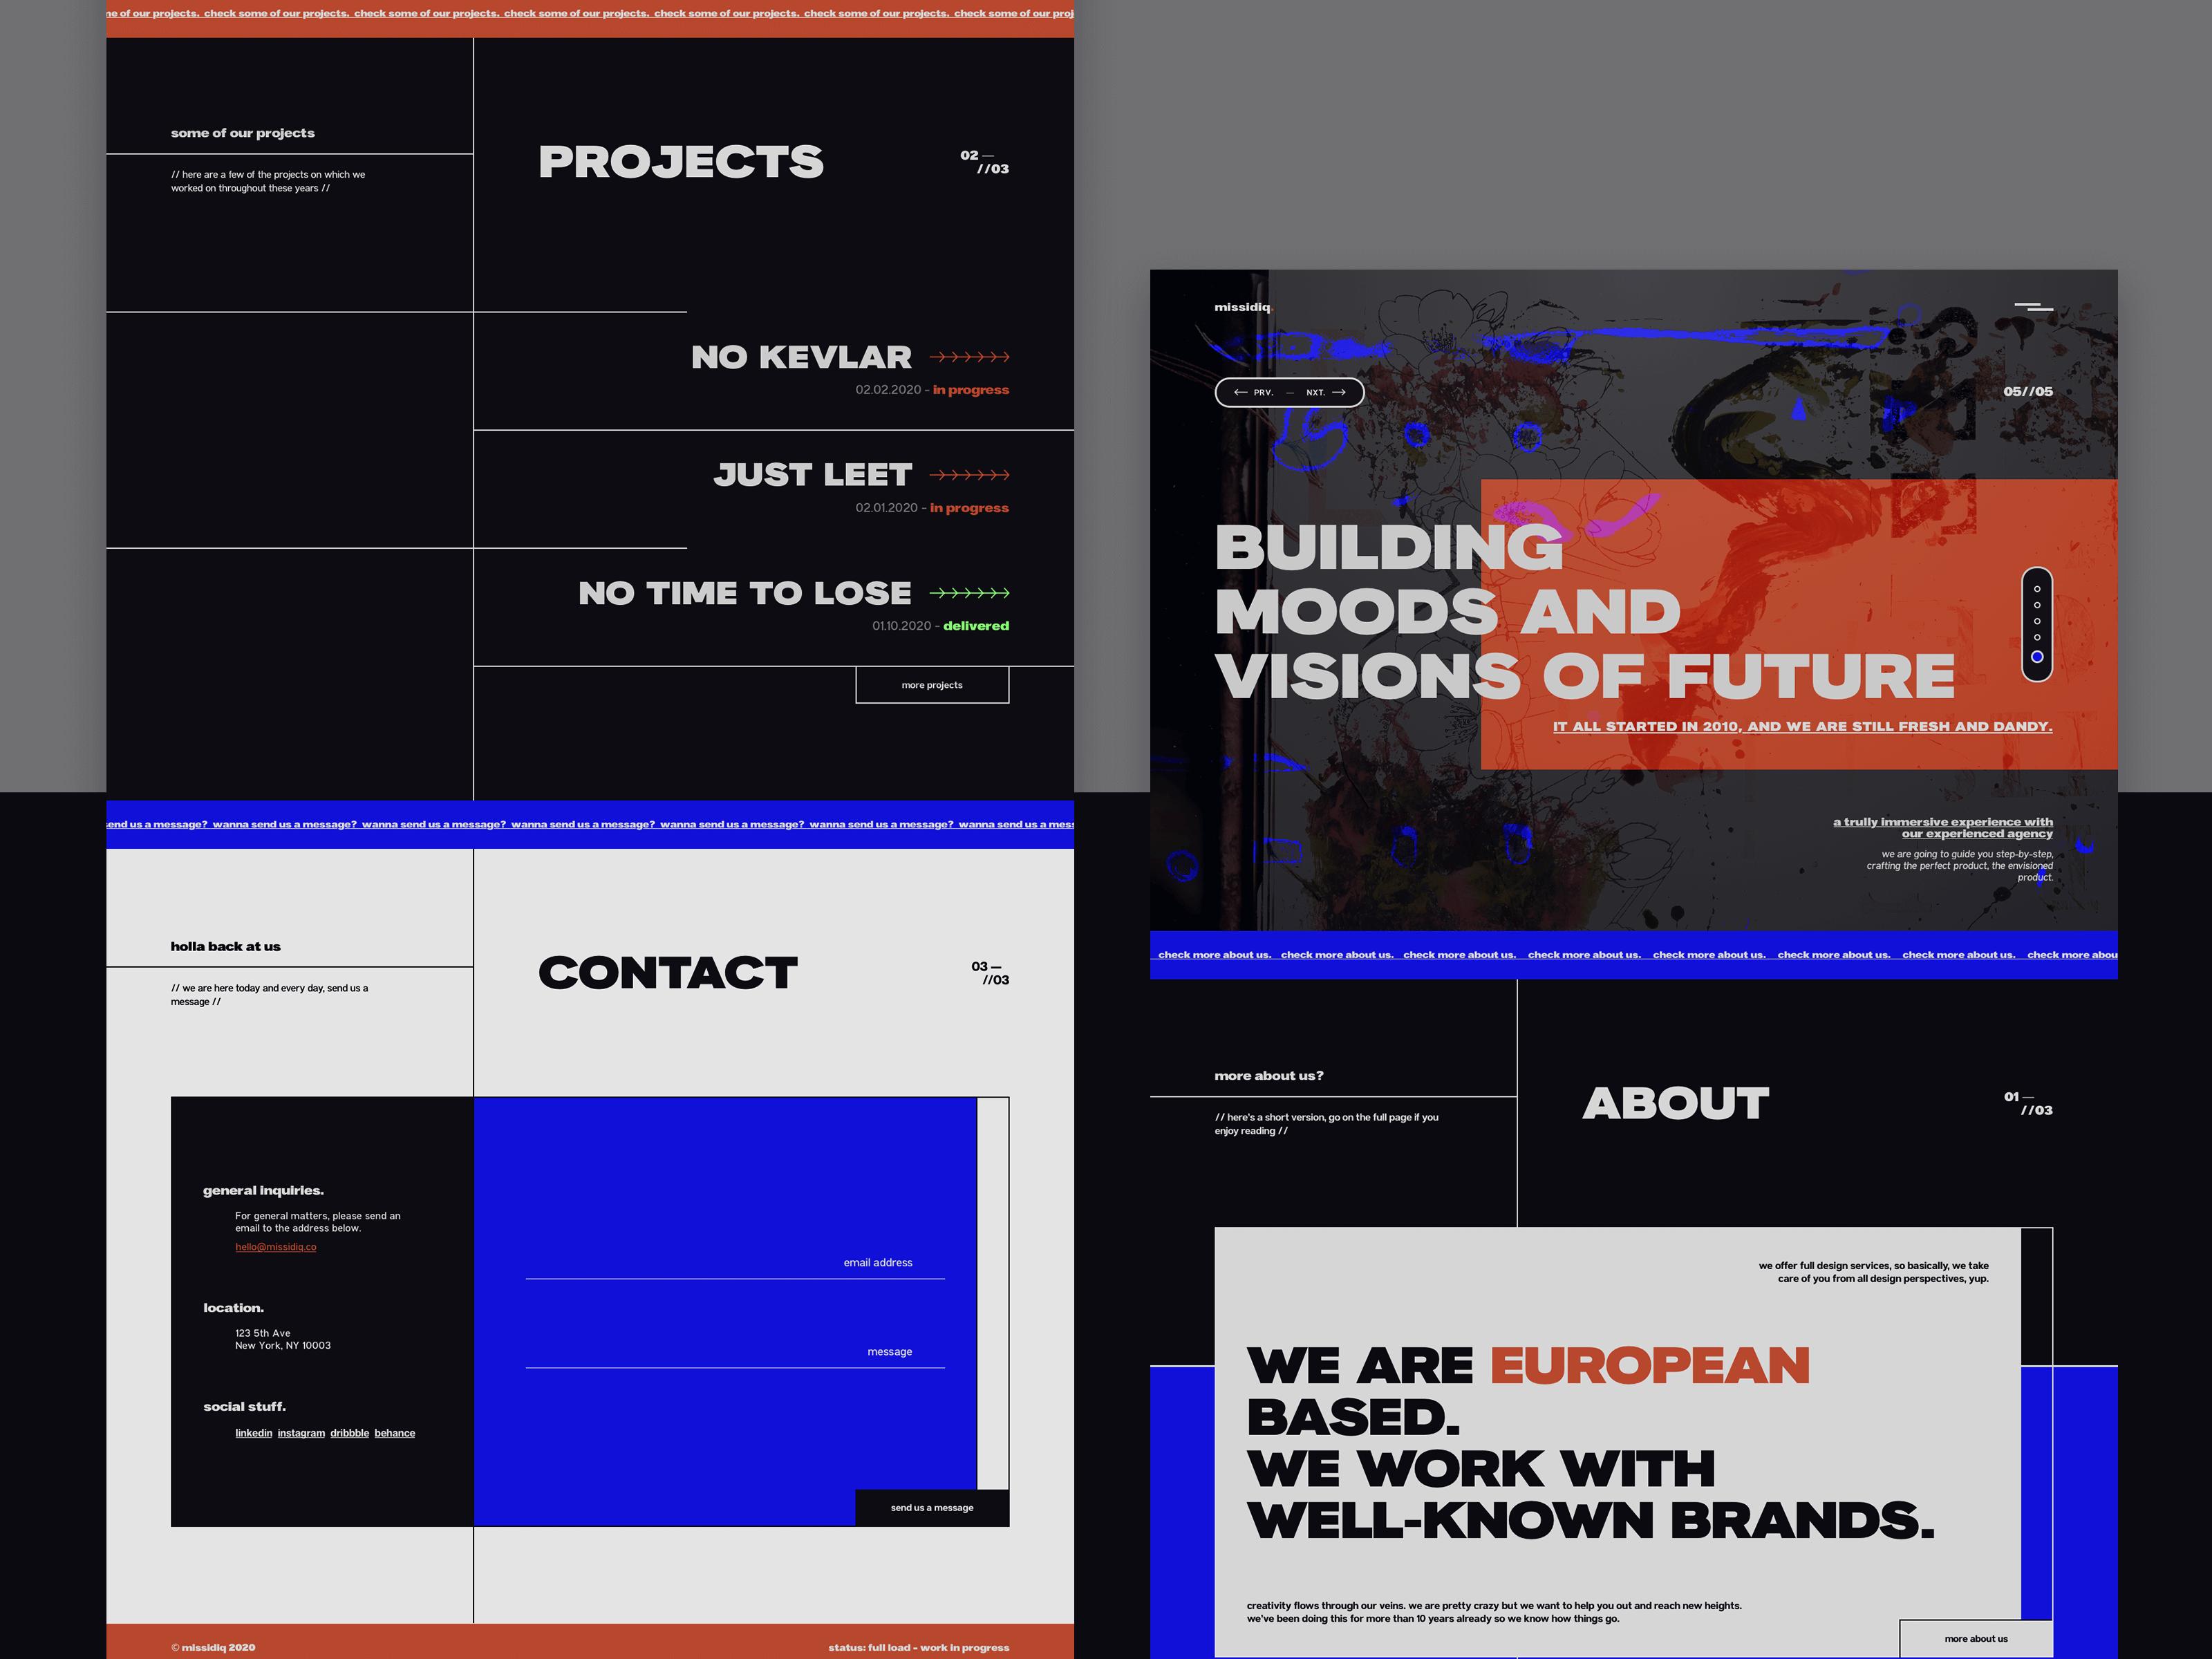 missidiq-Creative-agency-landing-page-design-1